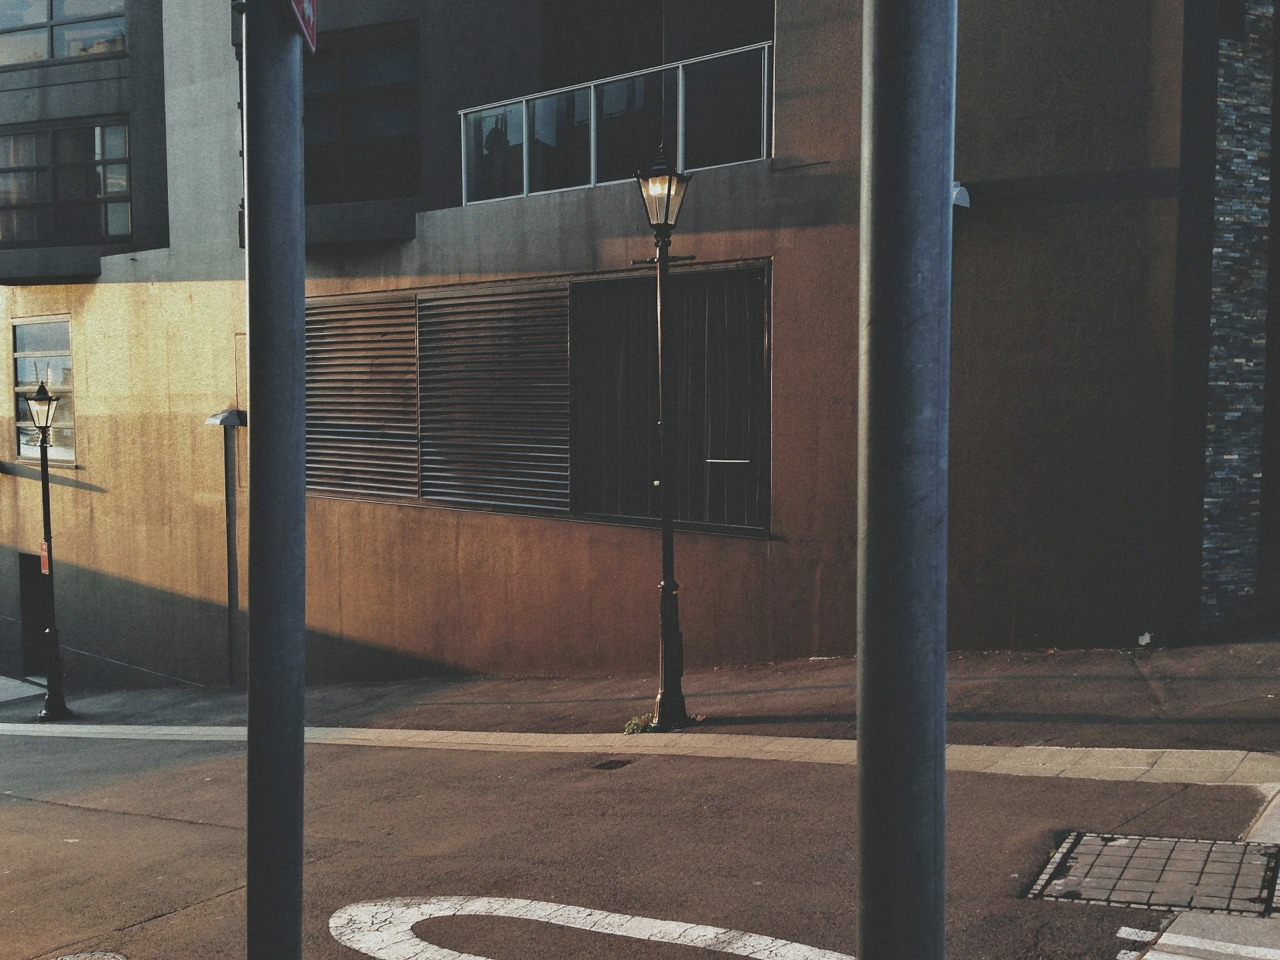 #streetphotography #sydney